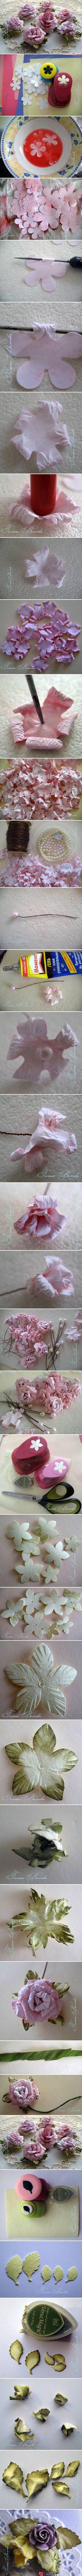 Soaking die cut flowers to make embellishments.